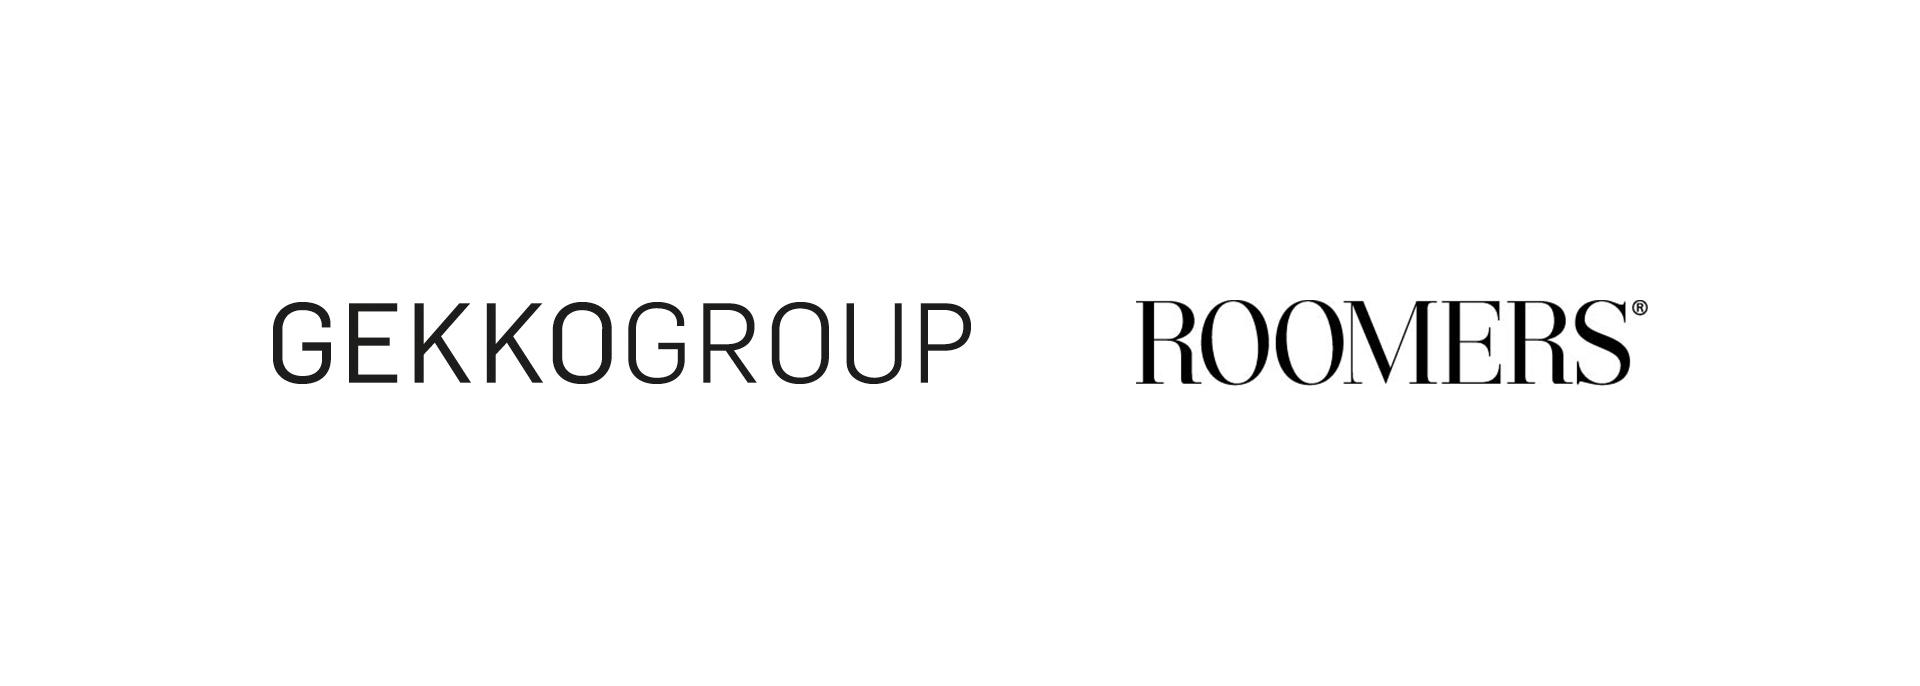 Make-A-wish-premium-partner-gekko-group-Roomers